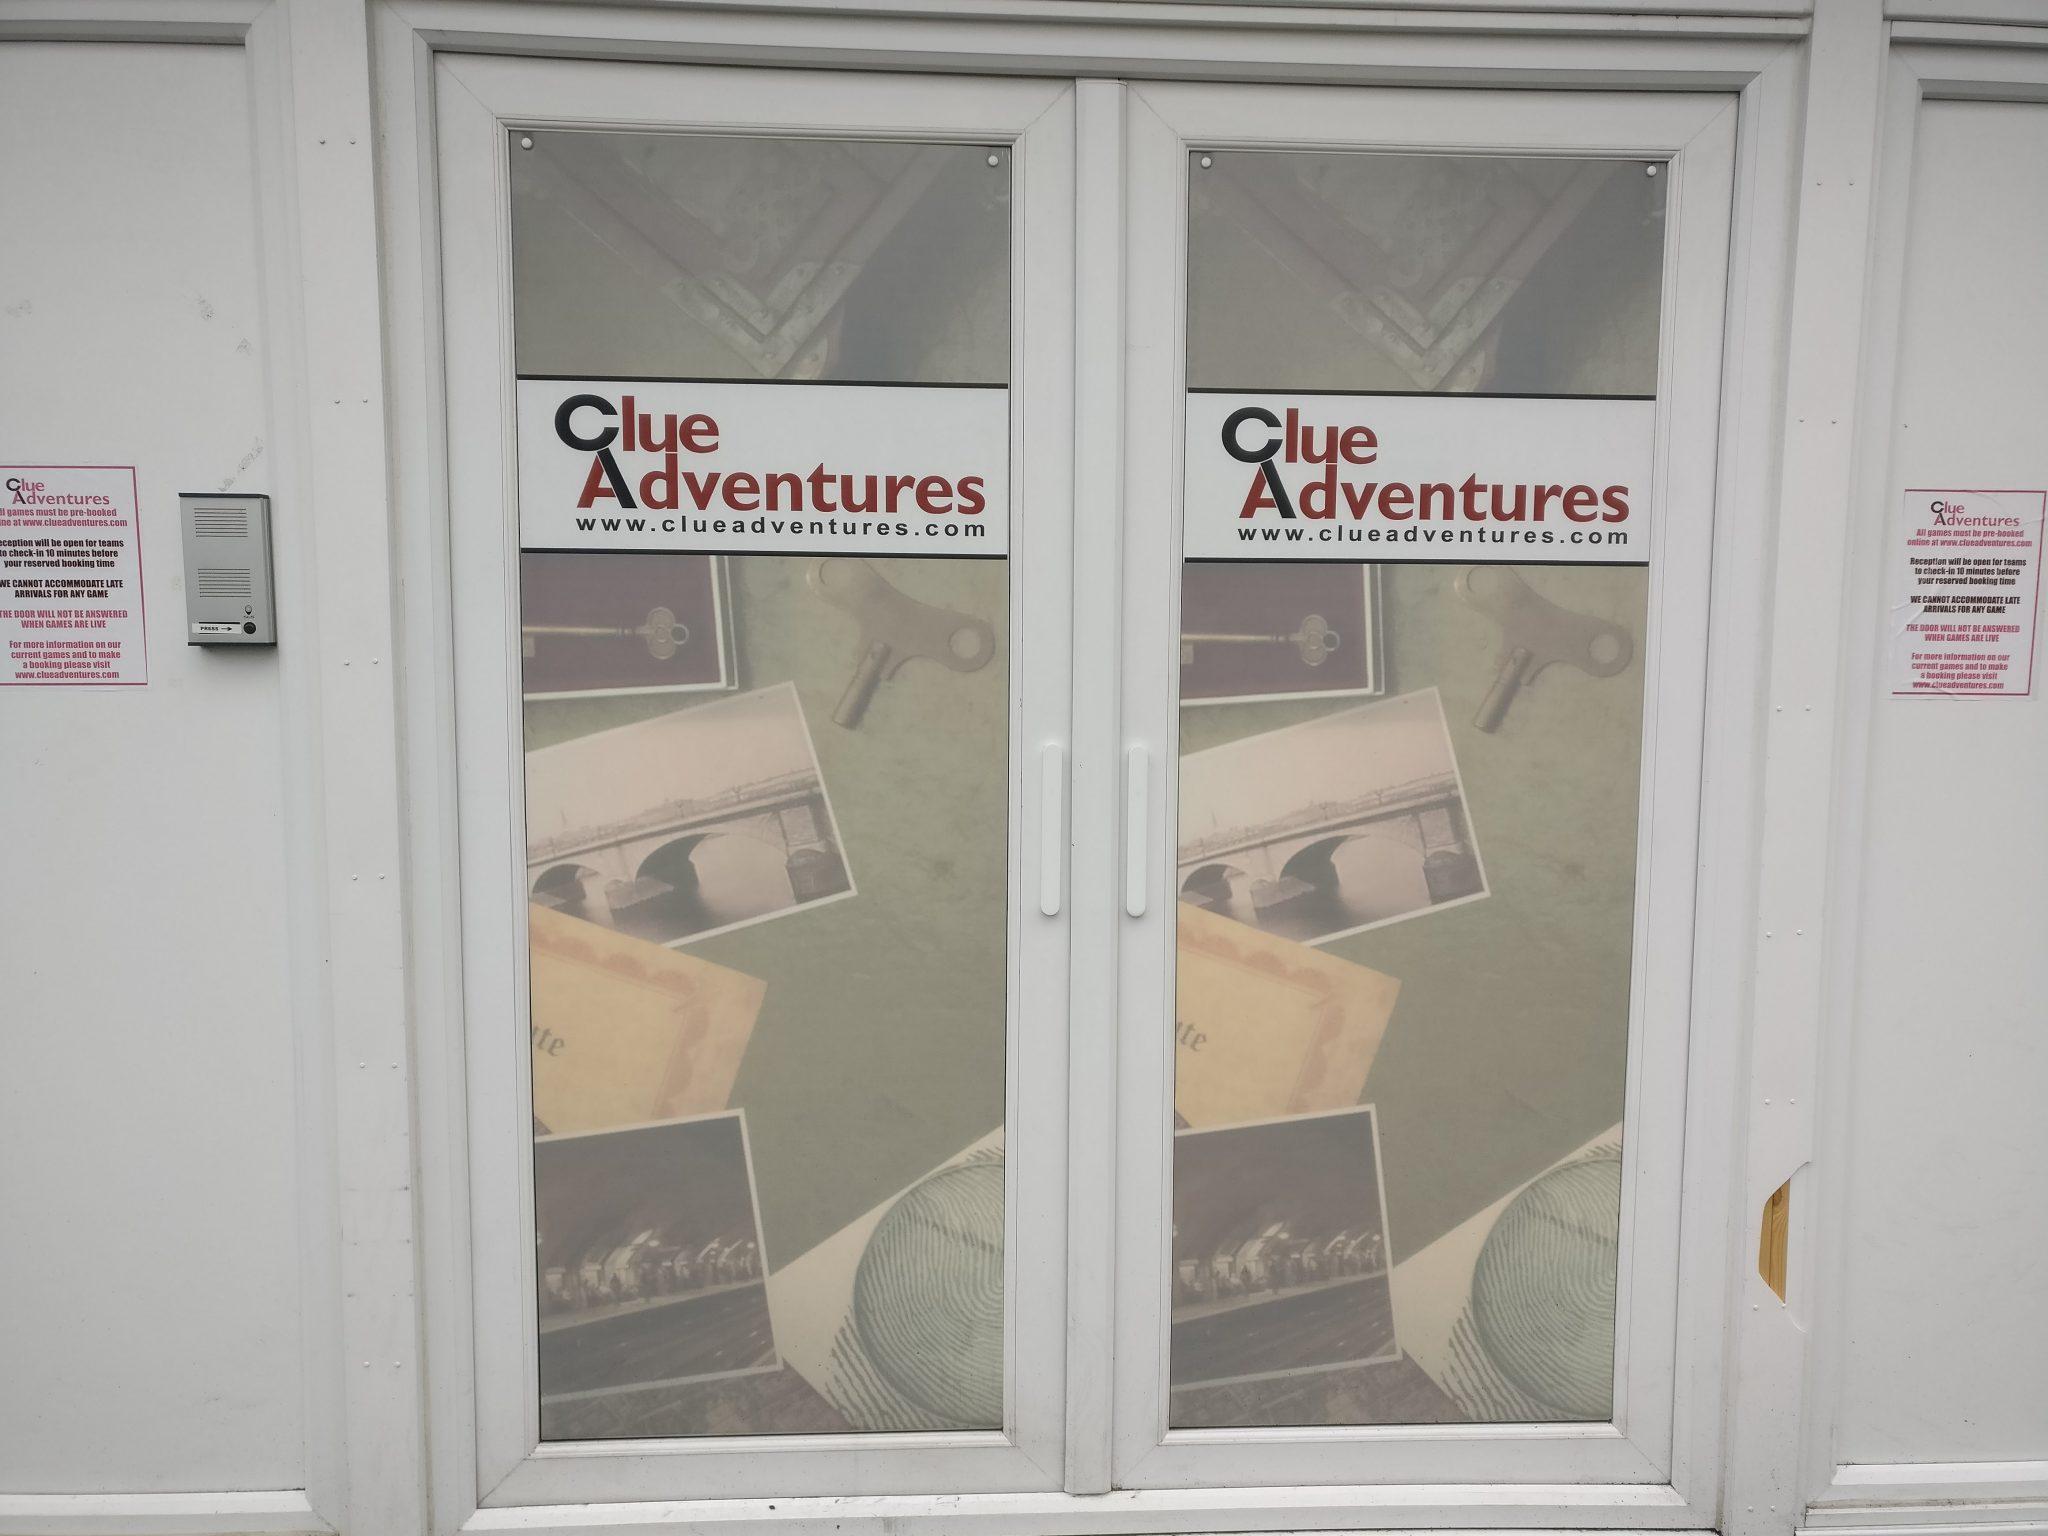 Clue Adventure's frontage